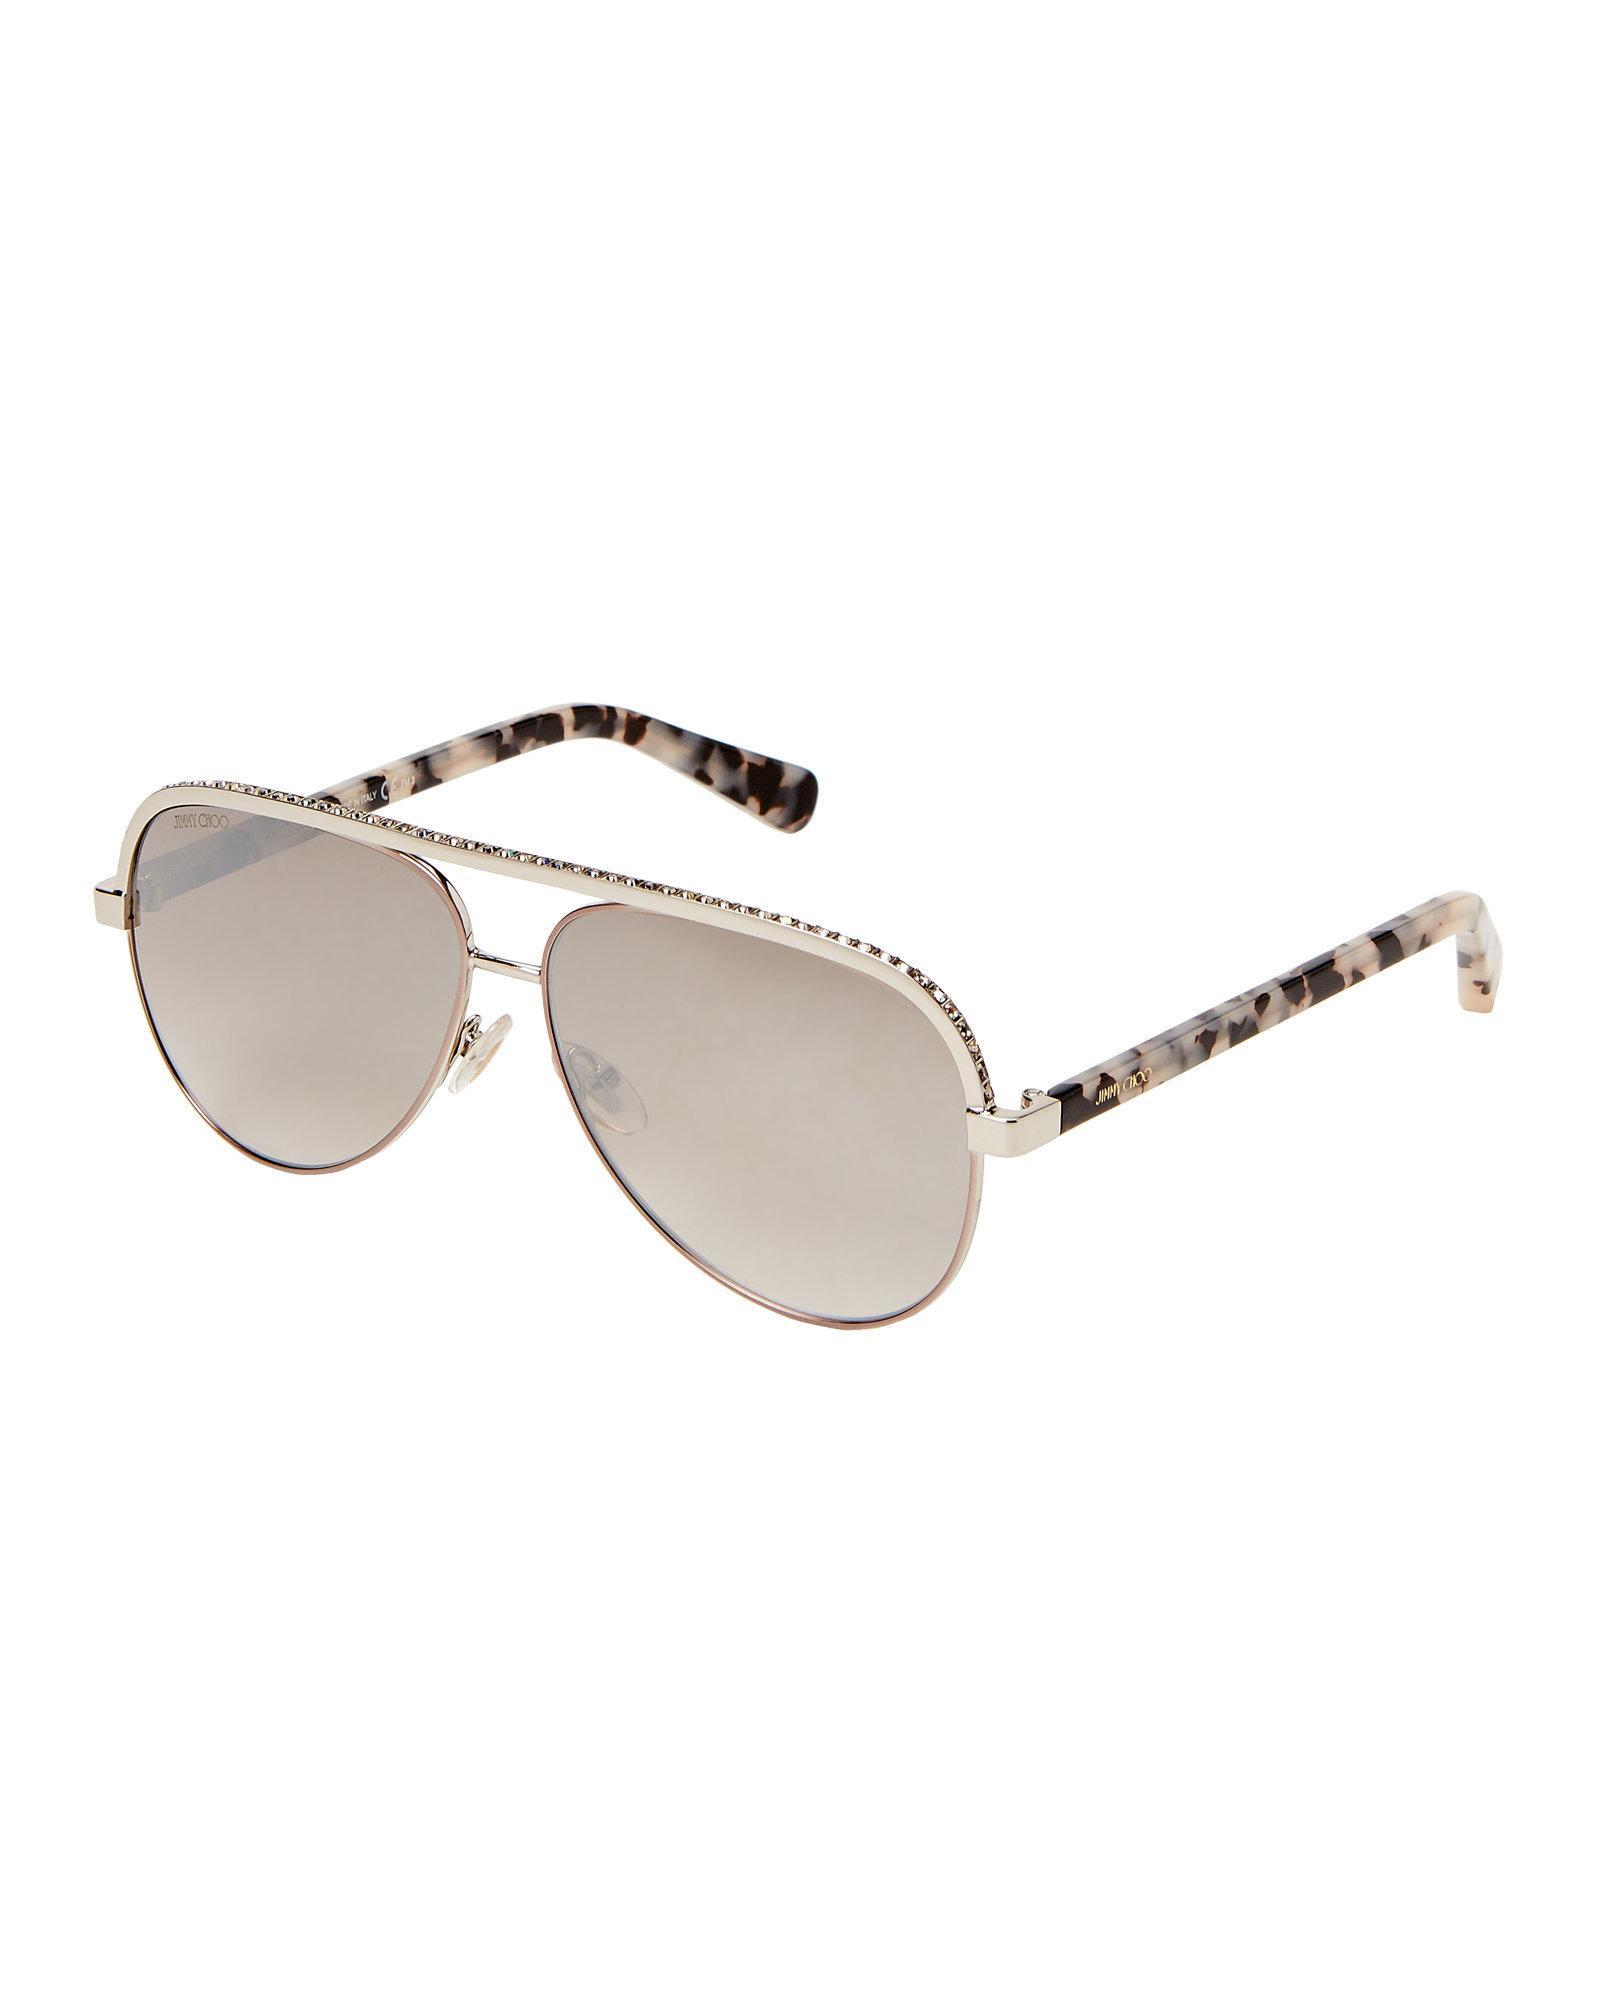 128d1880819 Lyst - Jimmy Choo Lina s Rhinestone Brow Aviator Sunglasses